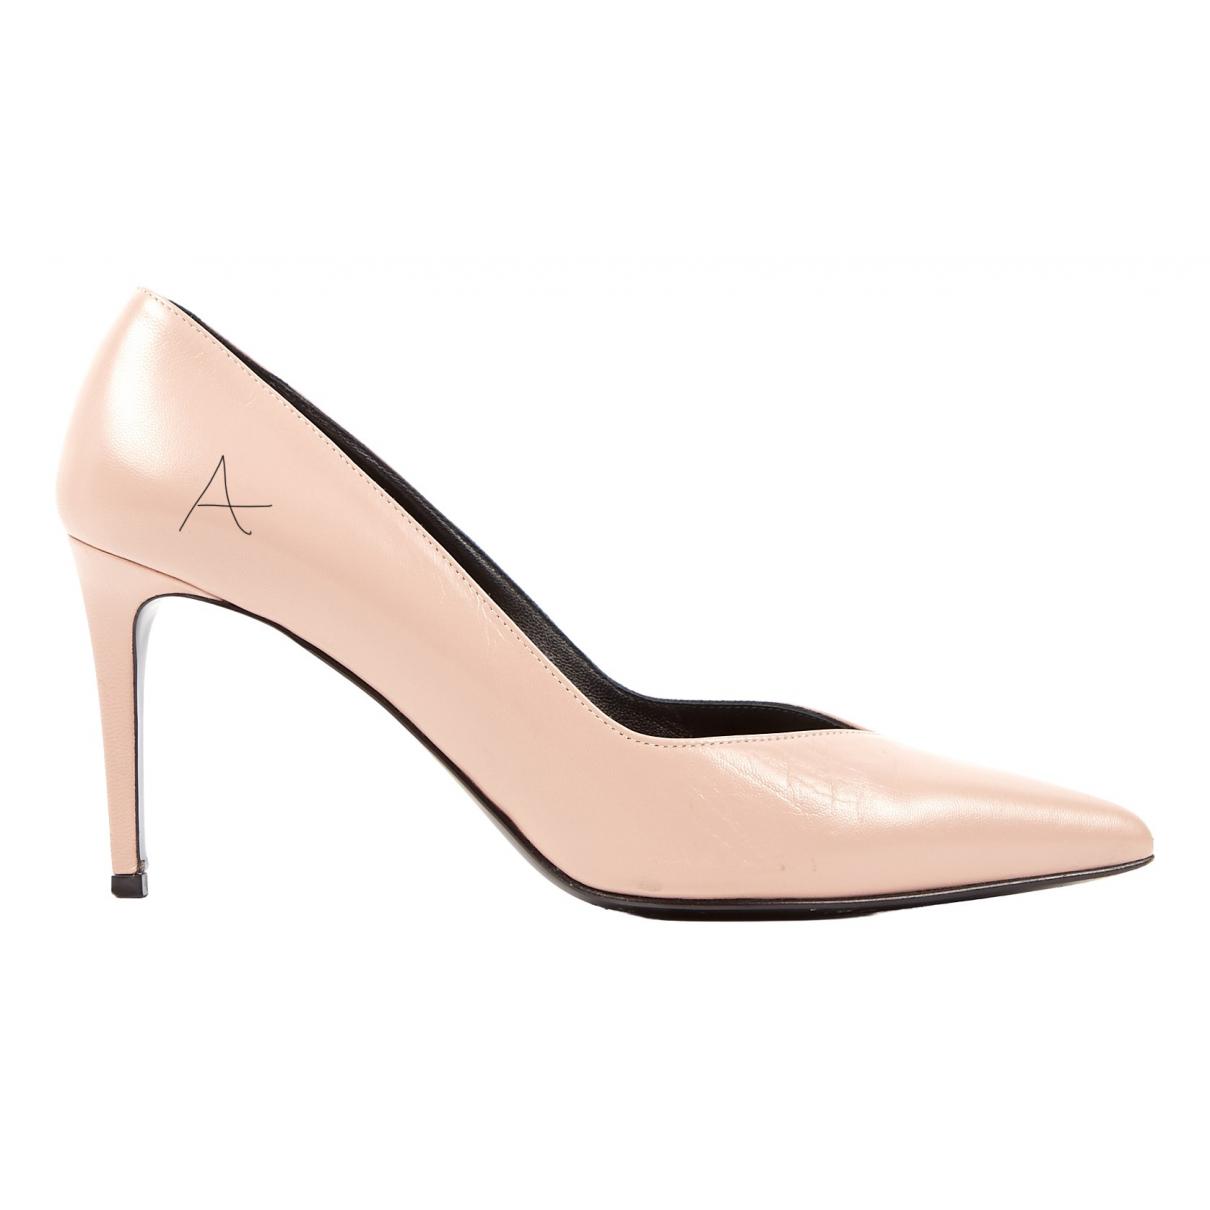 Dolce & Gabbana - Sac a main Lucia pour femme - gris